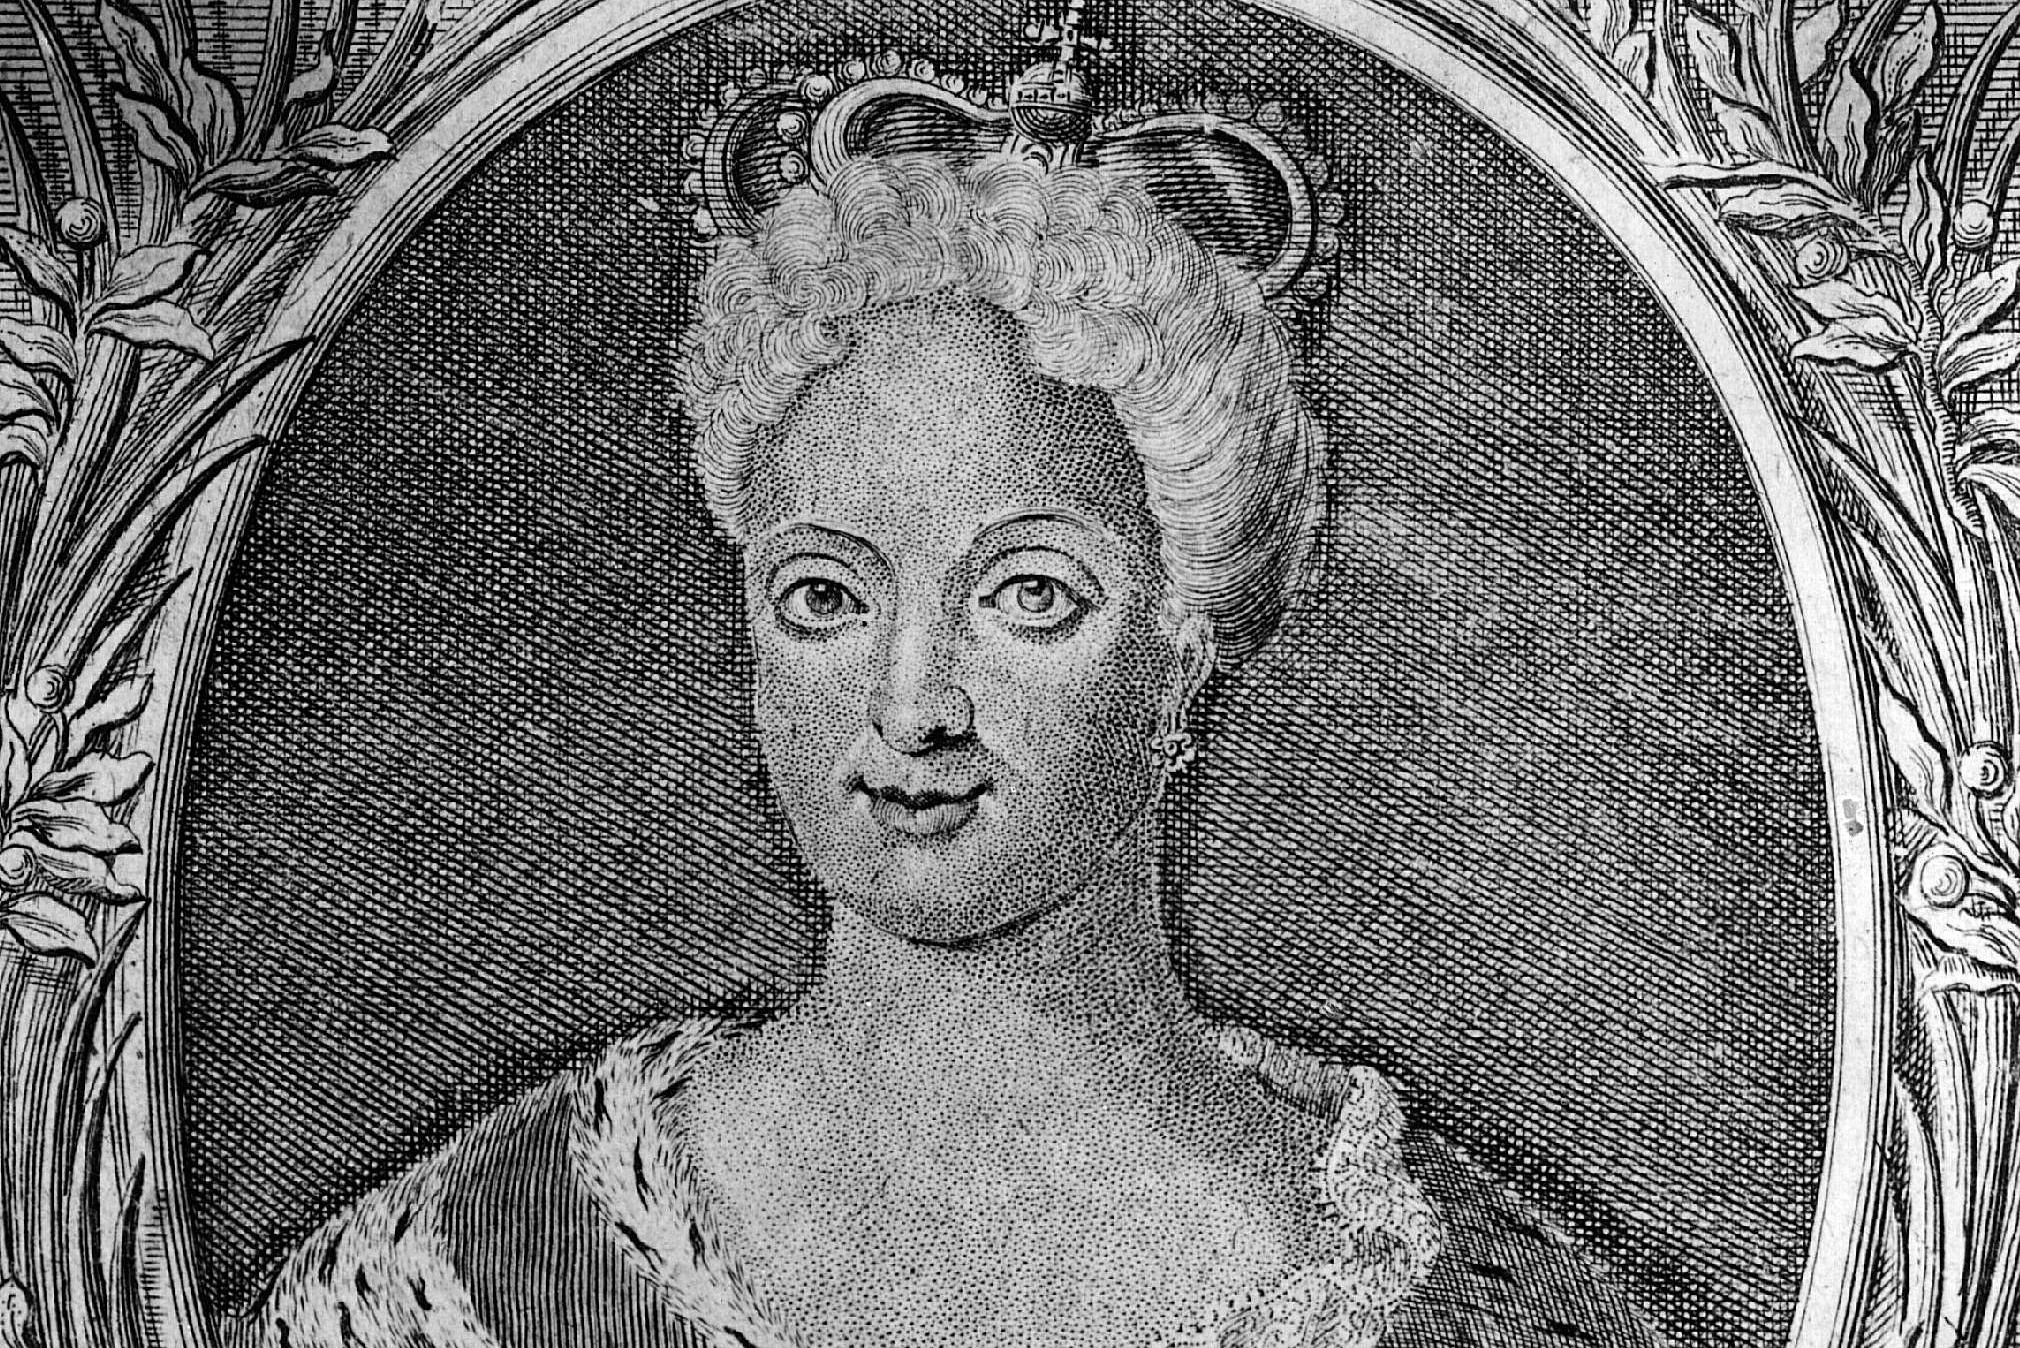 Maria Anna Josefa Antoinette of Austria, Queen of Portugal, about 1730